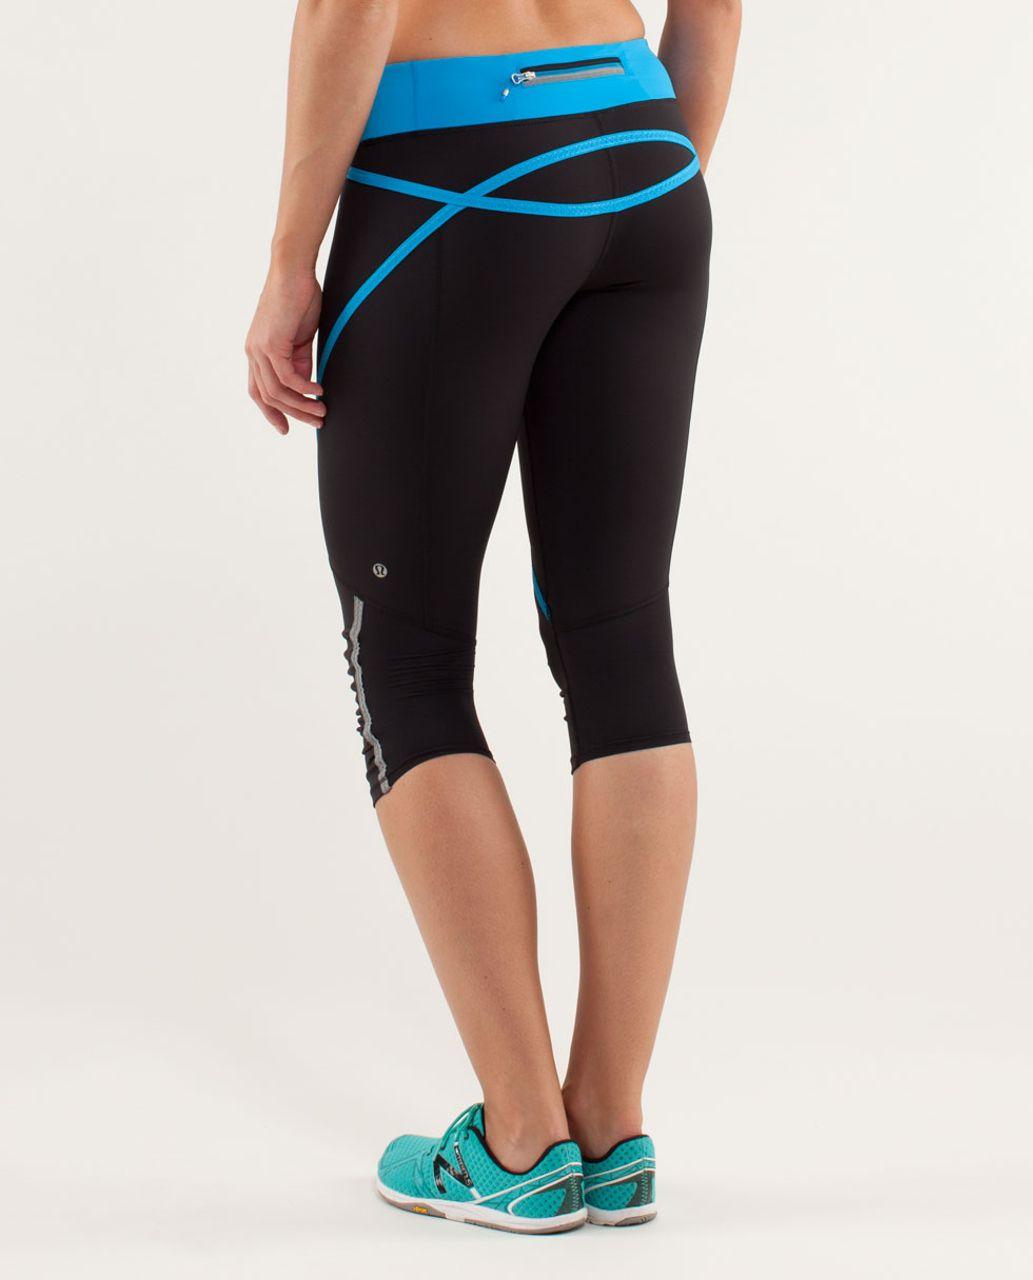 Lululemon Run:  Pace Crop - Black / Beach Blanket Blue / Wee Are From Space Aquamarine